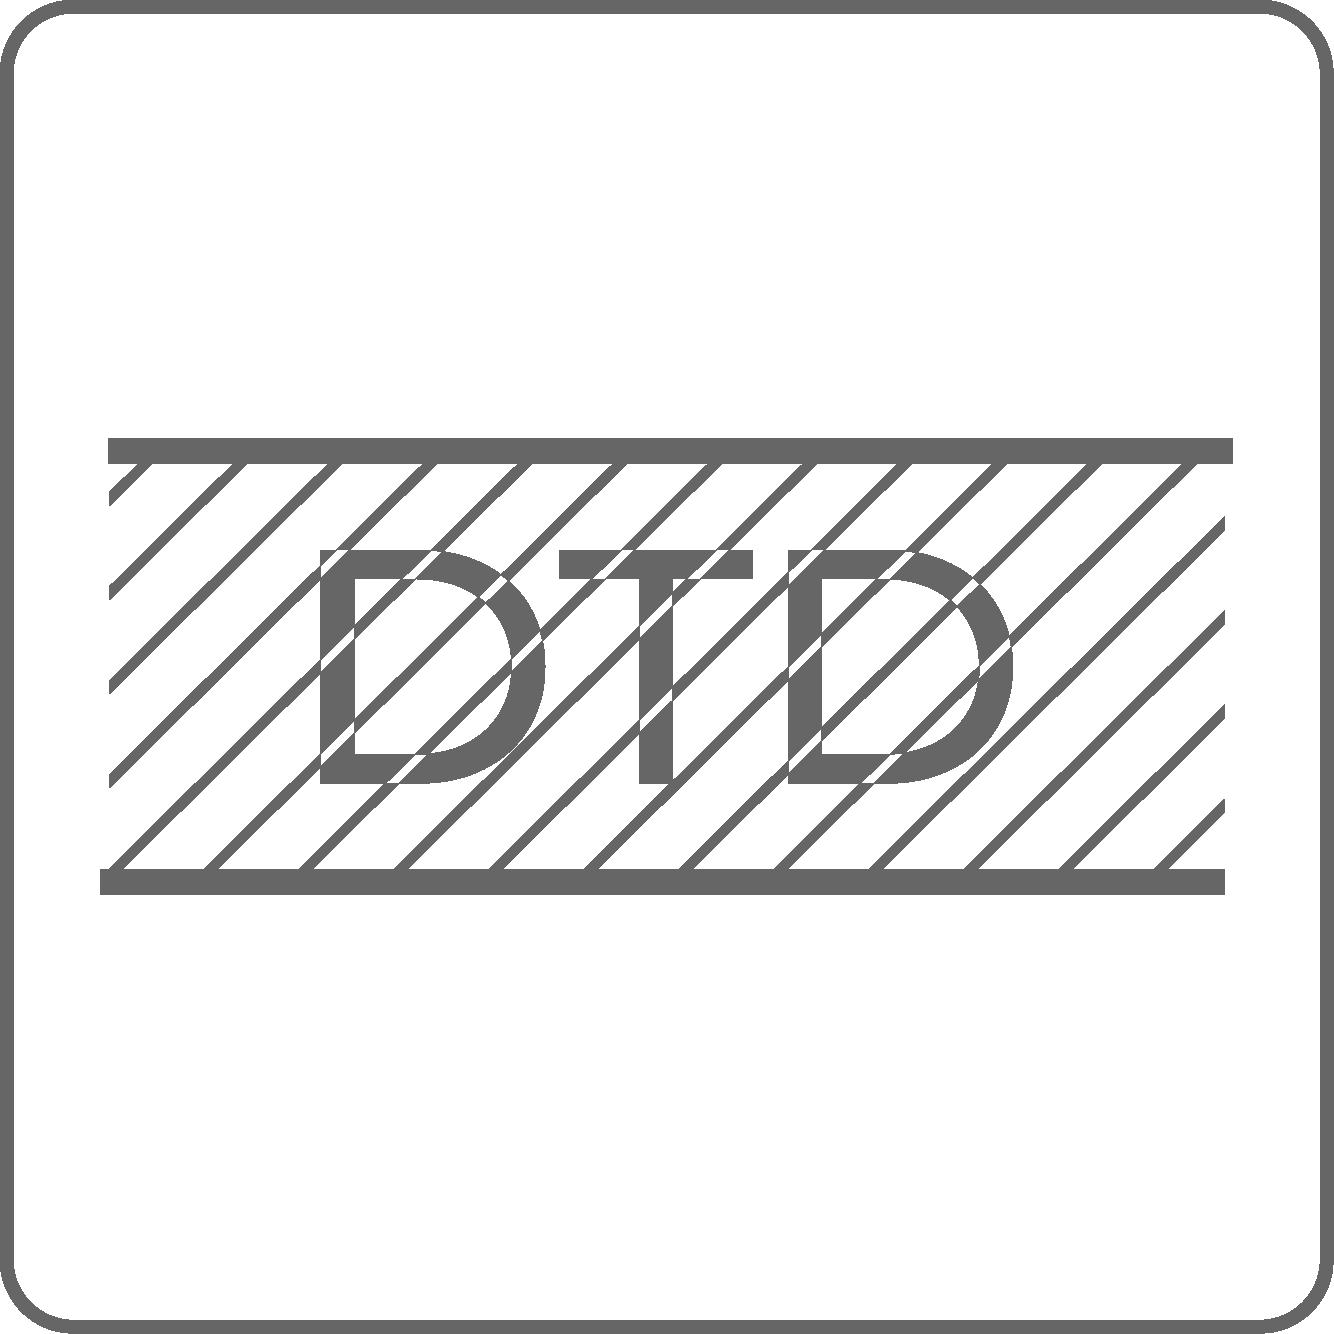 dtd-01.png